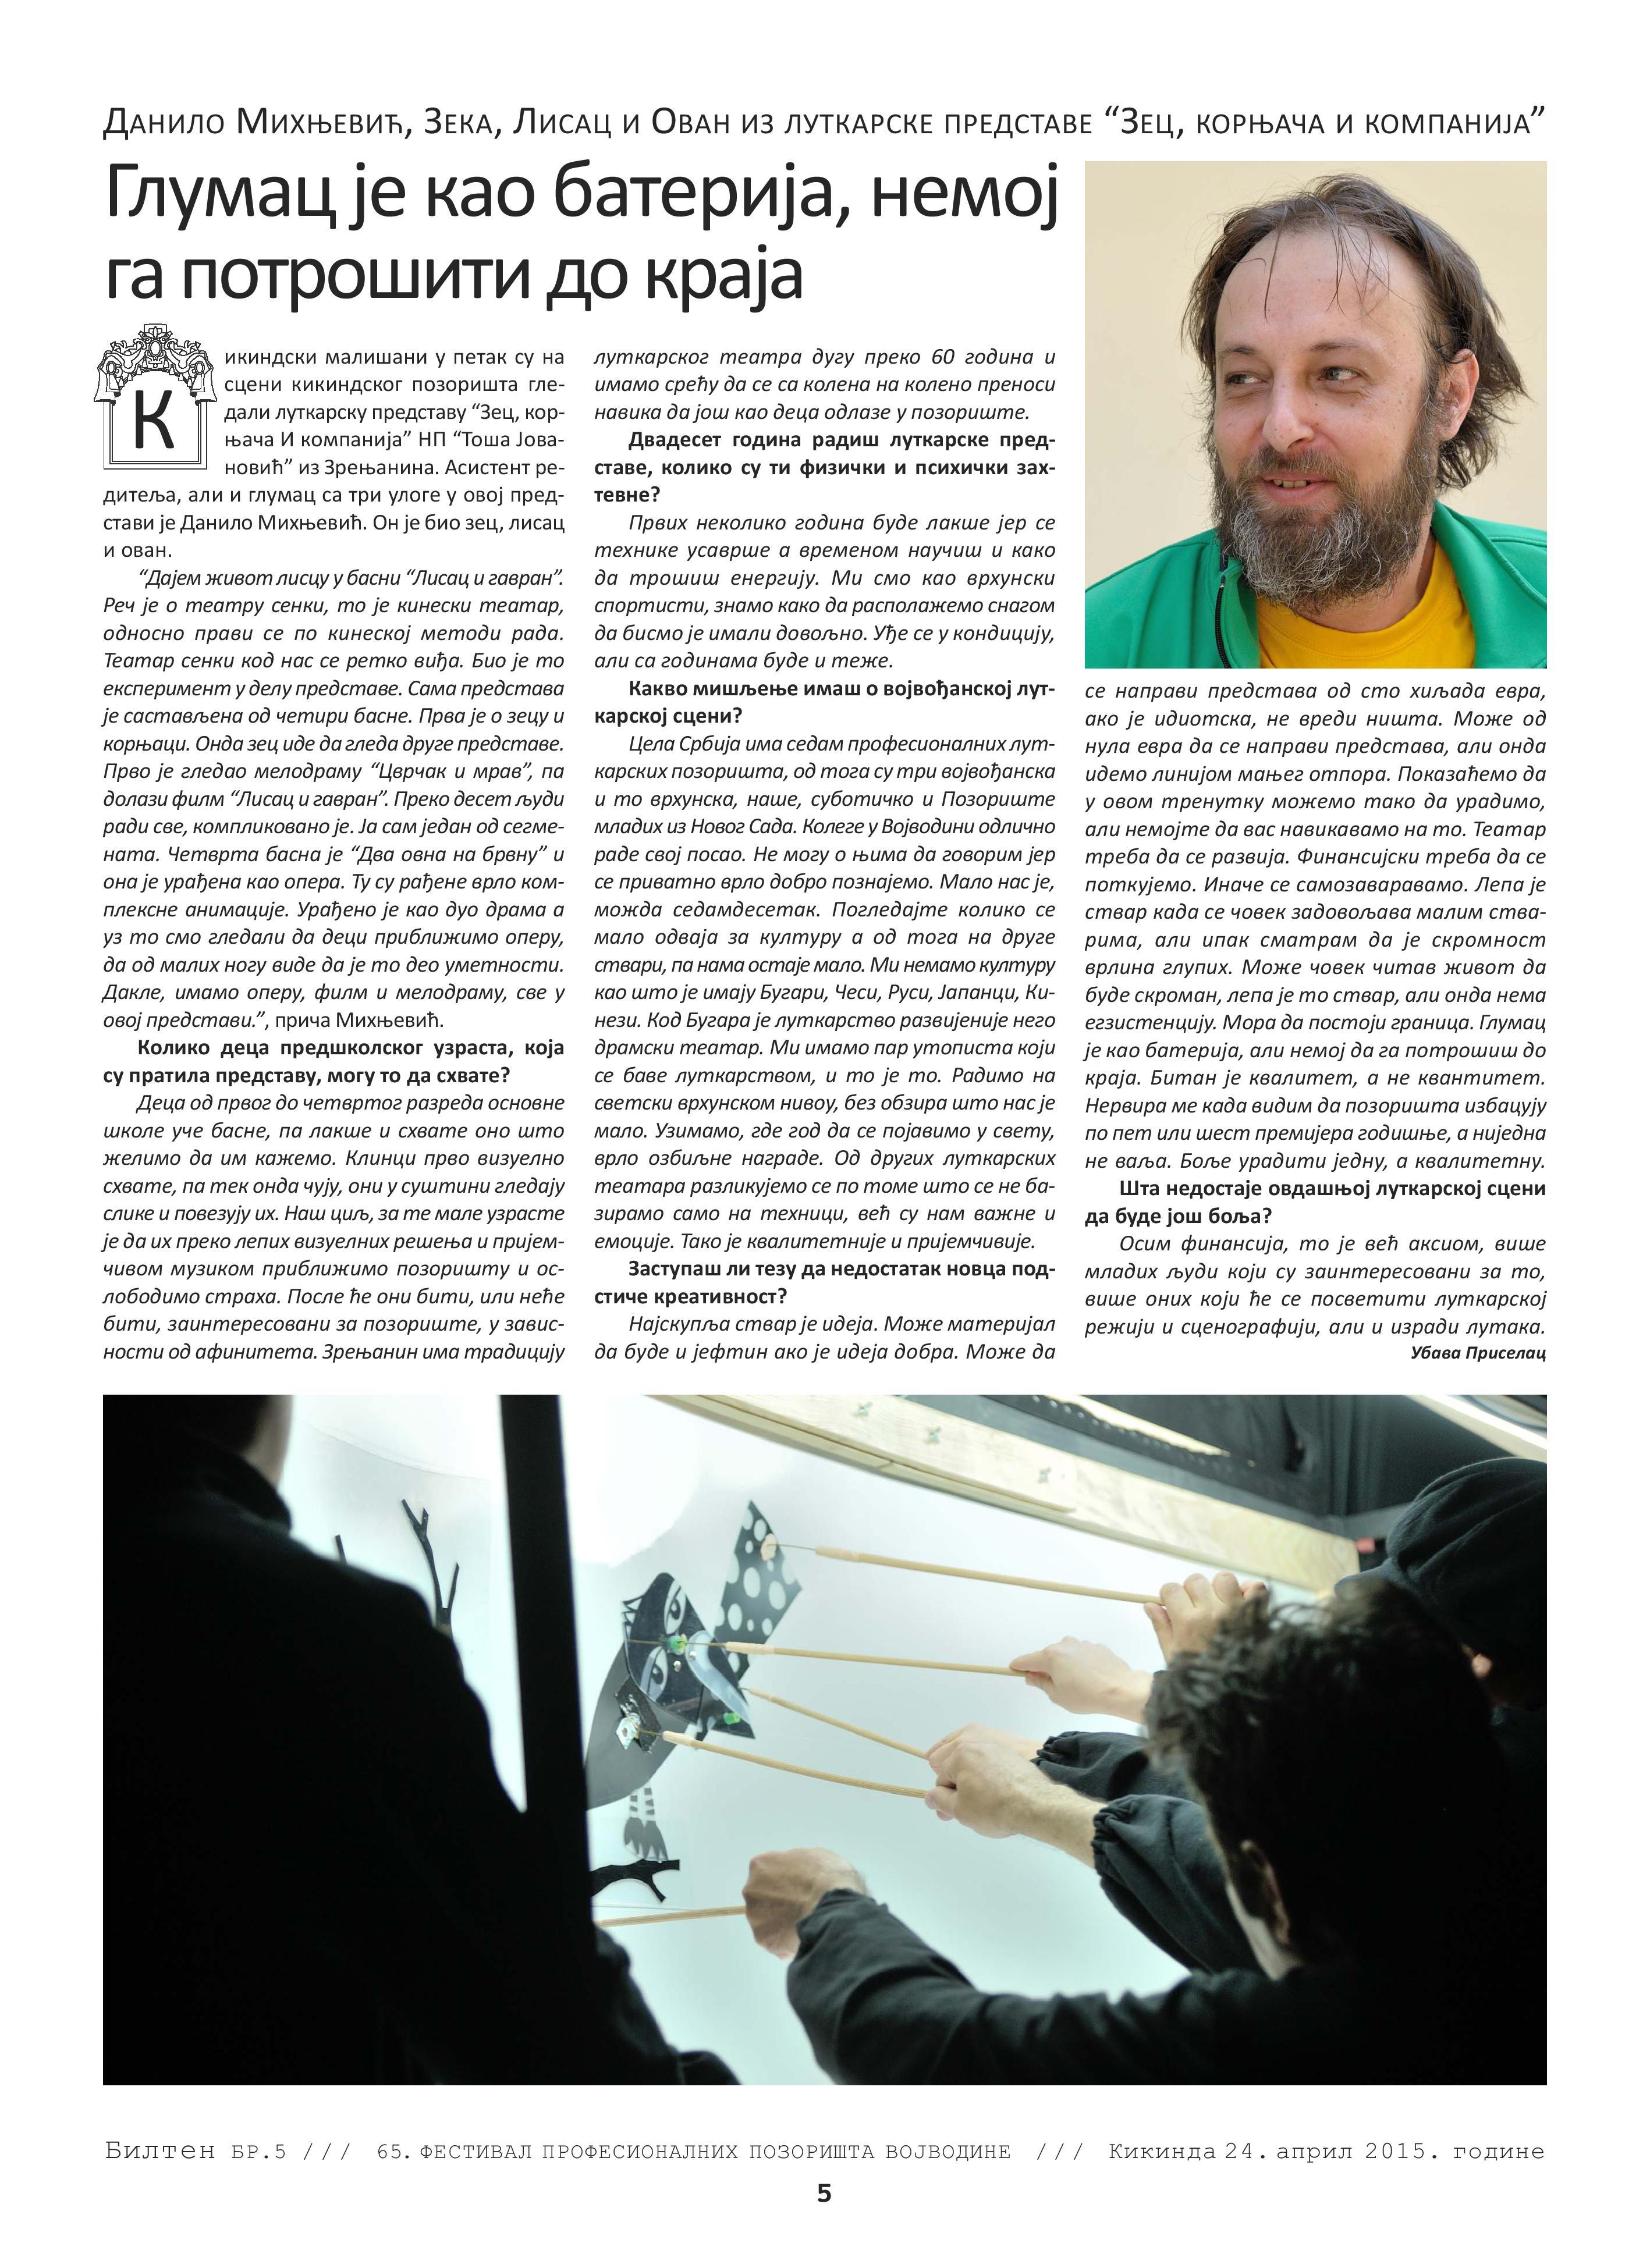 BILTEN_05_24 april-page-005